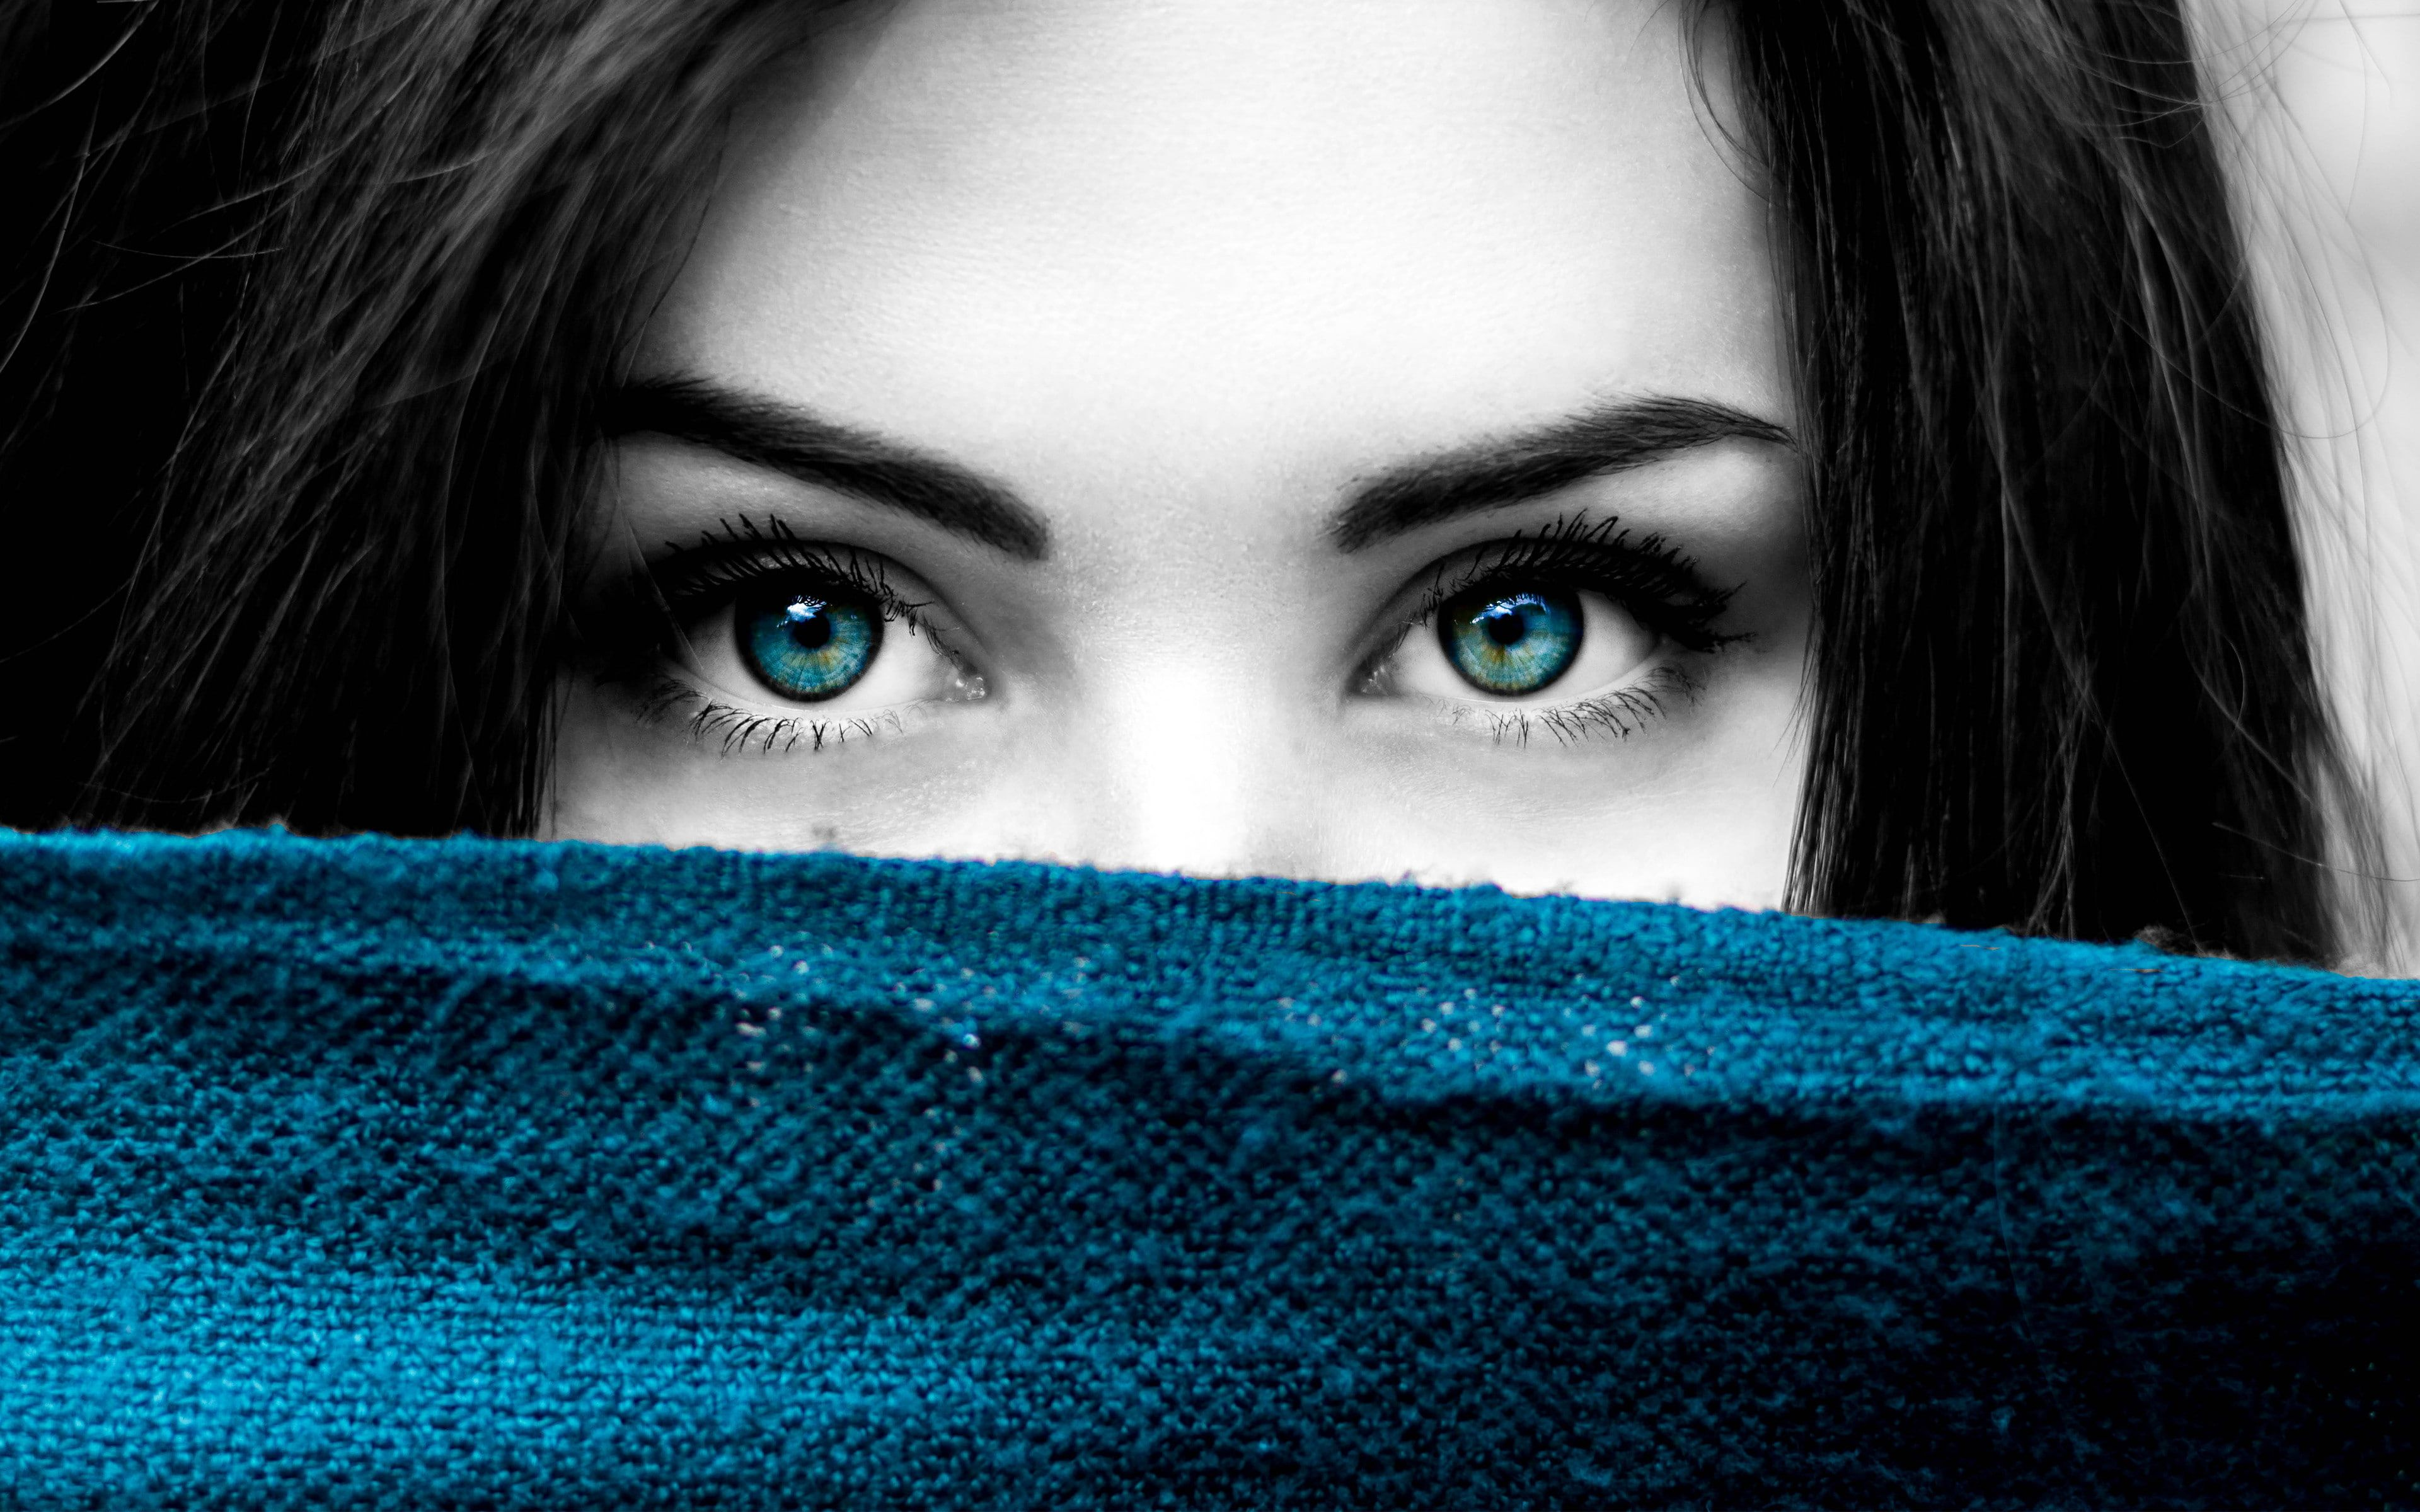 Blue Eyes Girl 4k 8k Beuty 4k Wallpaper Hdwallpaper Desktop Remove Dark Circles Blue Eyed Girls Blue Eyes